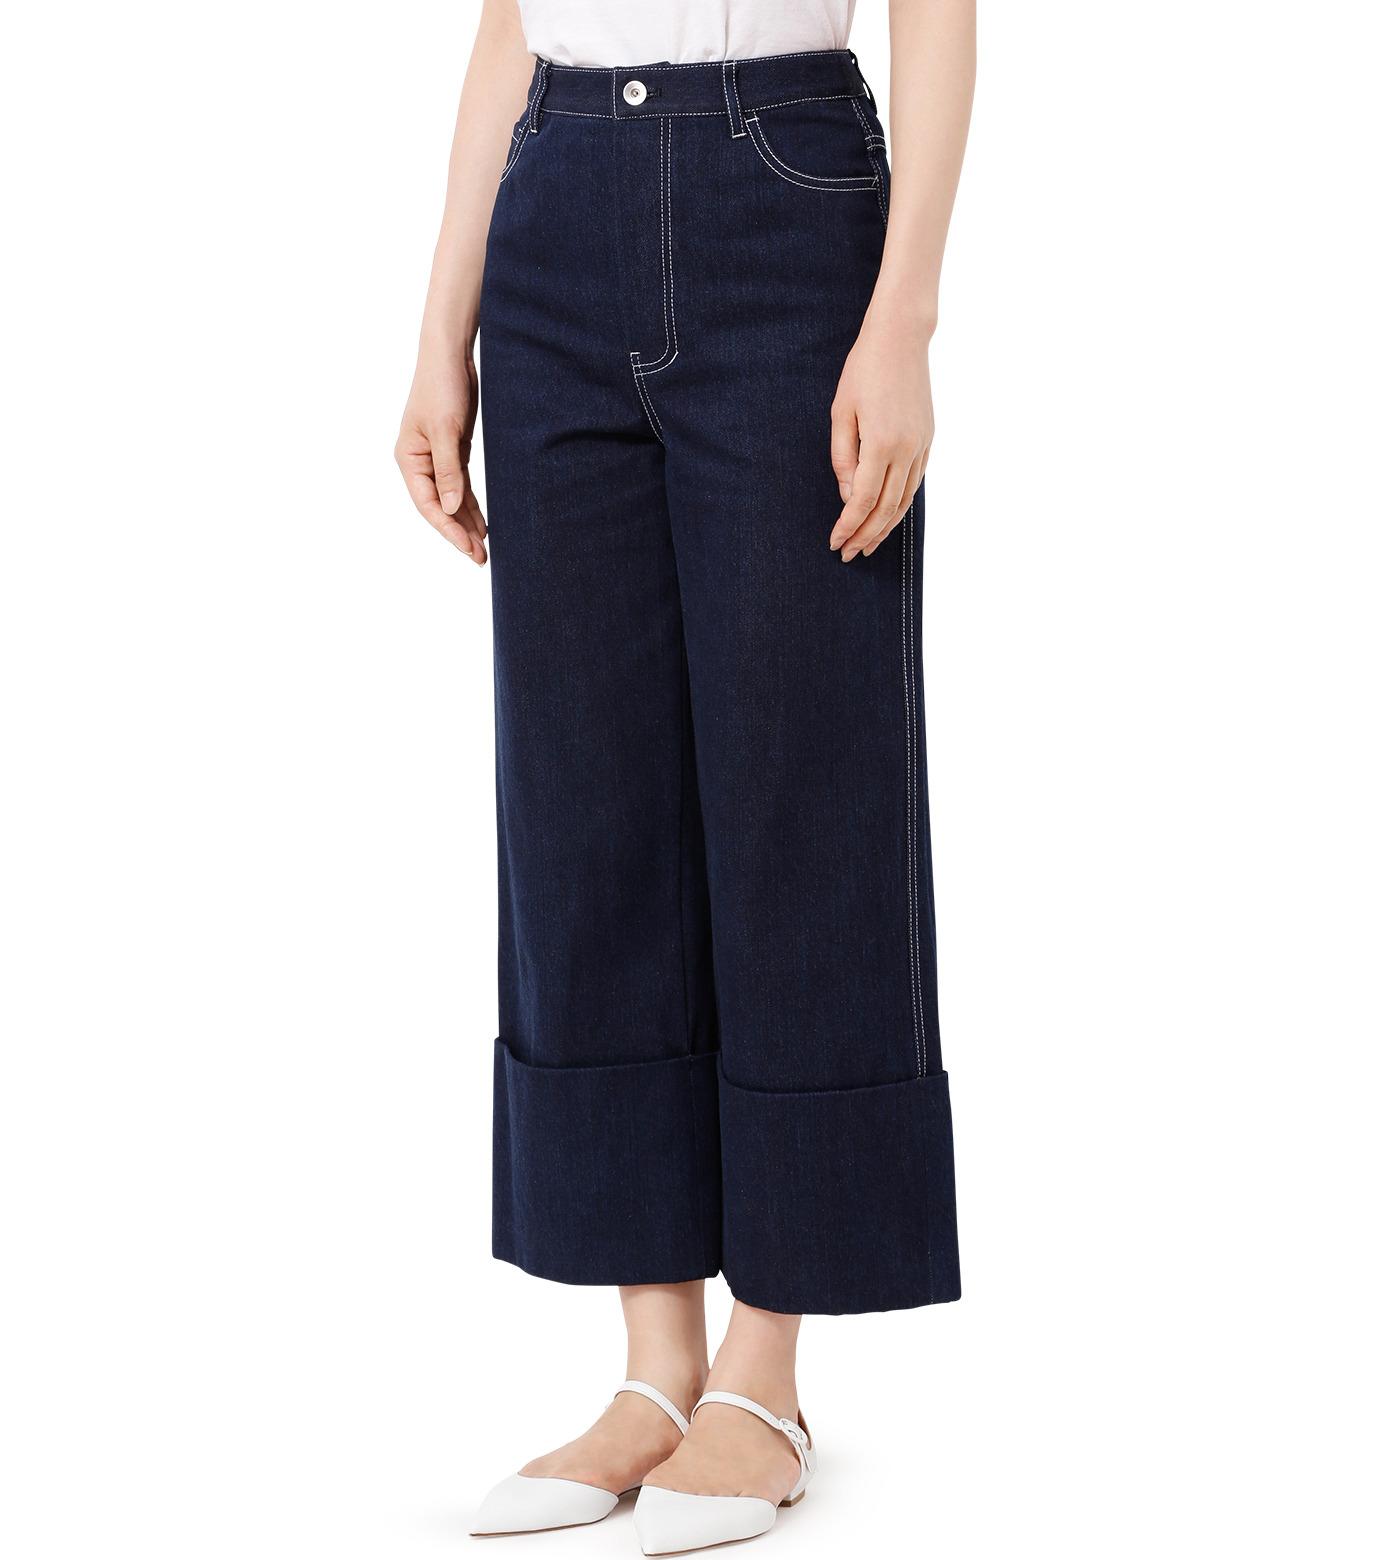 LE CIEL BLEU(ルシェルブルー)のデニムフォールドバックパンツ-INDIGO(パンツ/pants)-18A68304 拡大詳細画像1